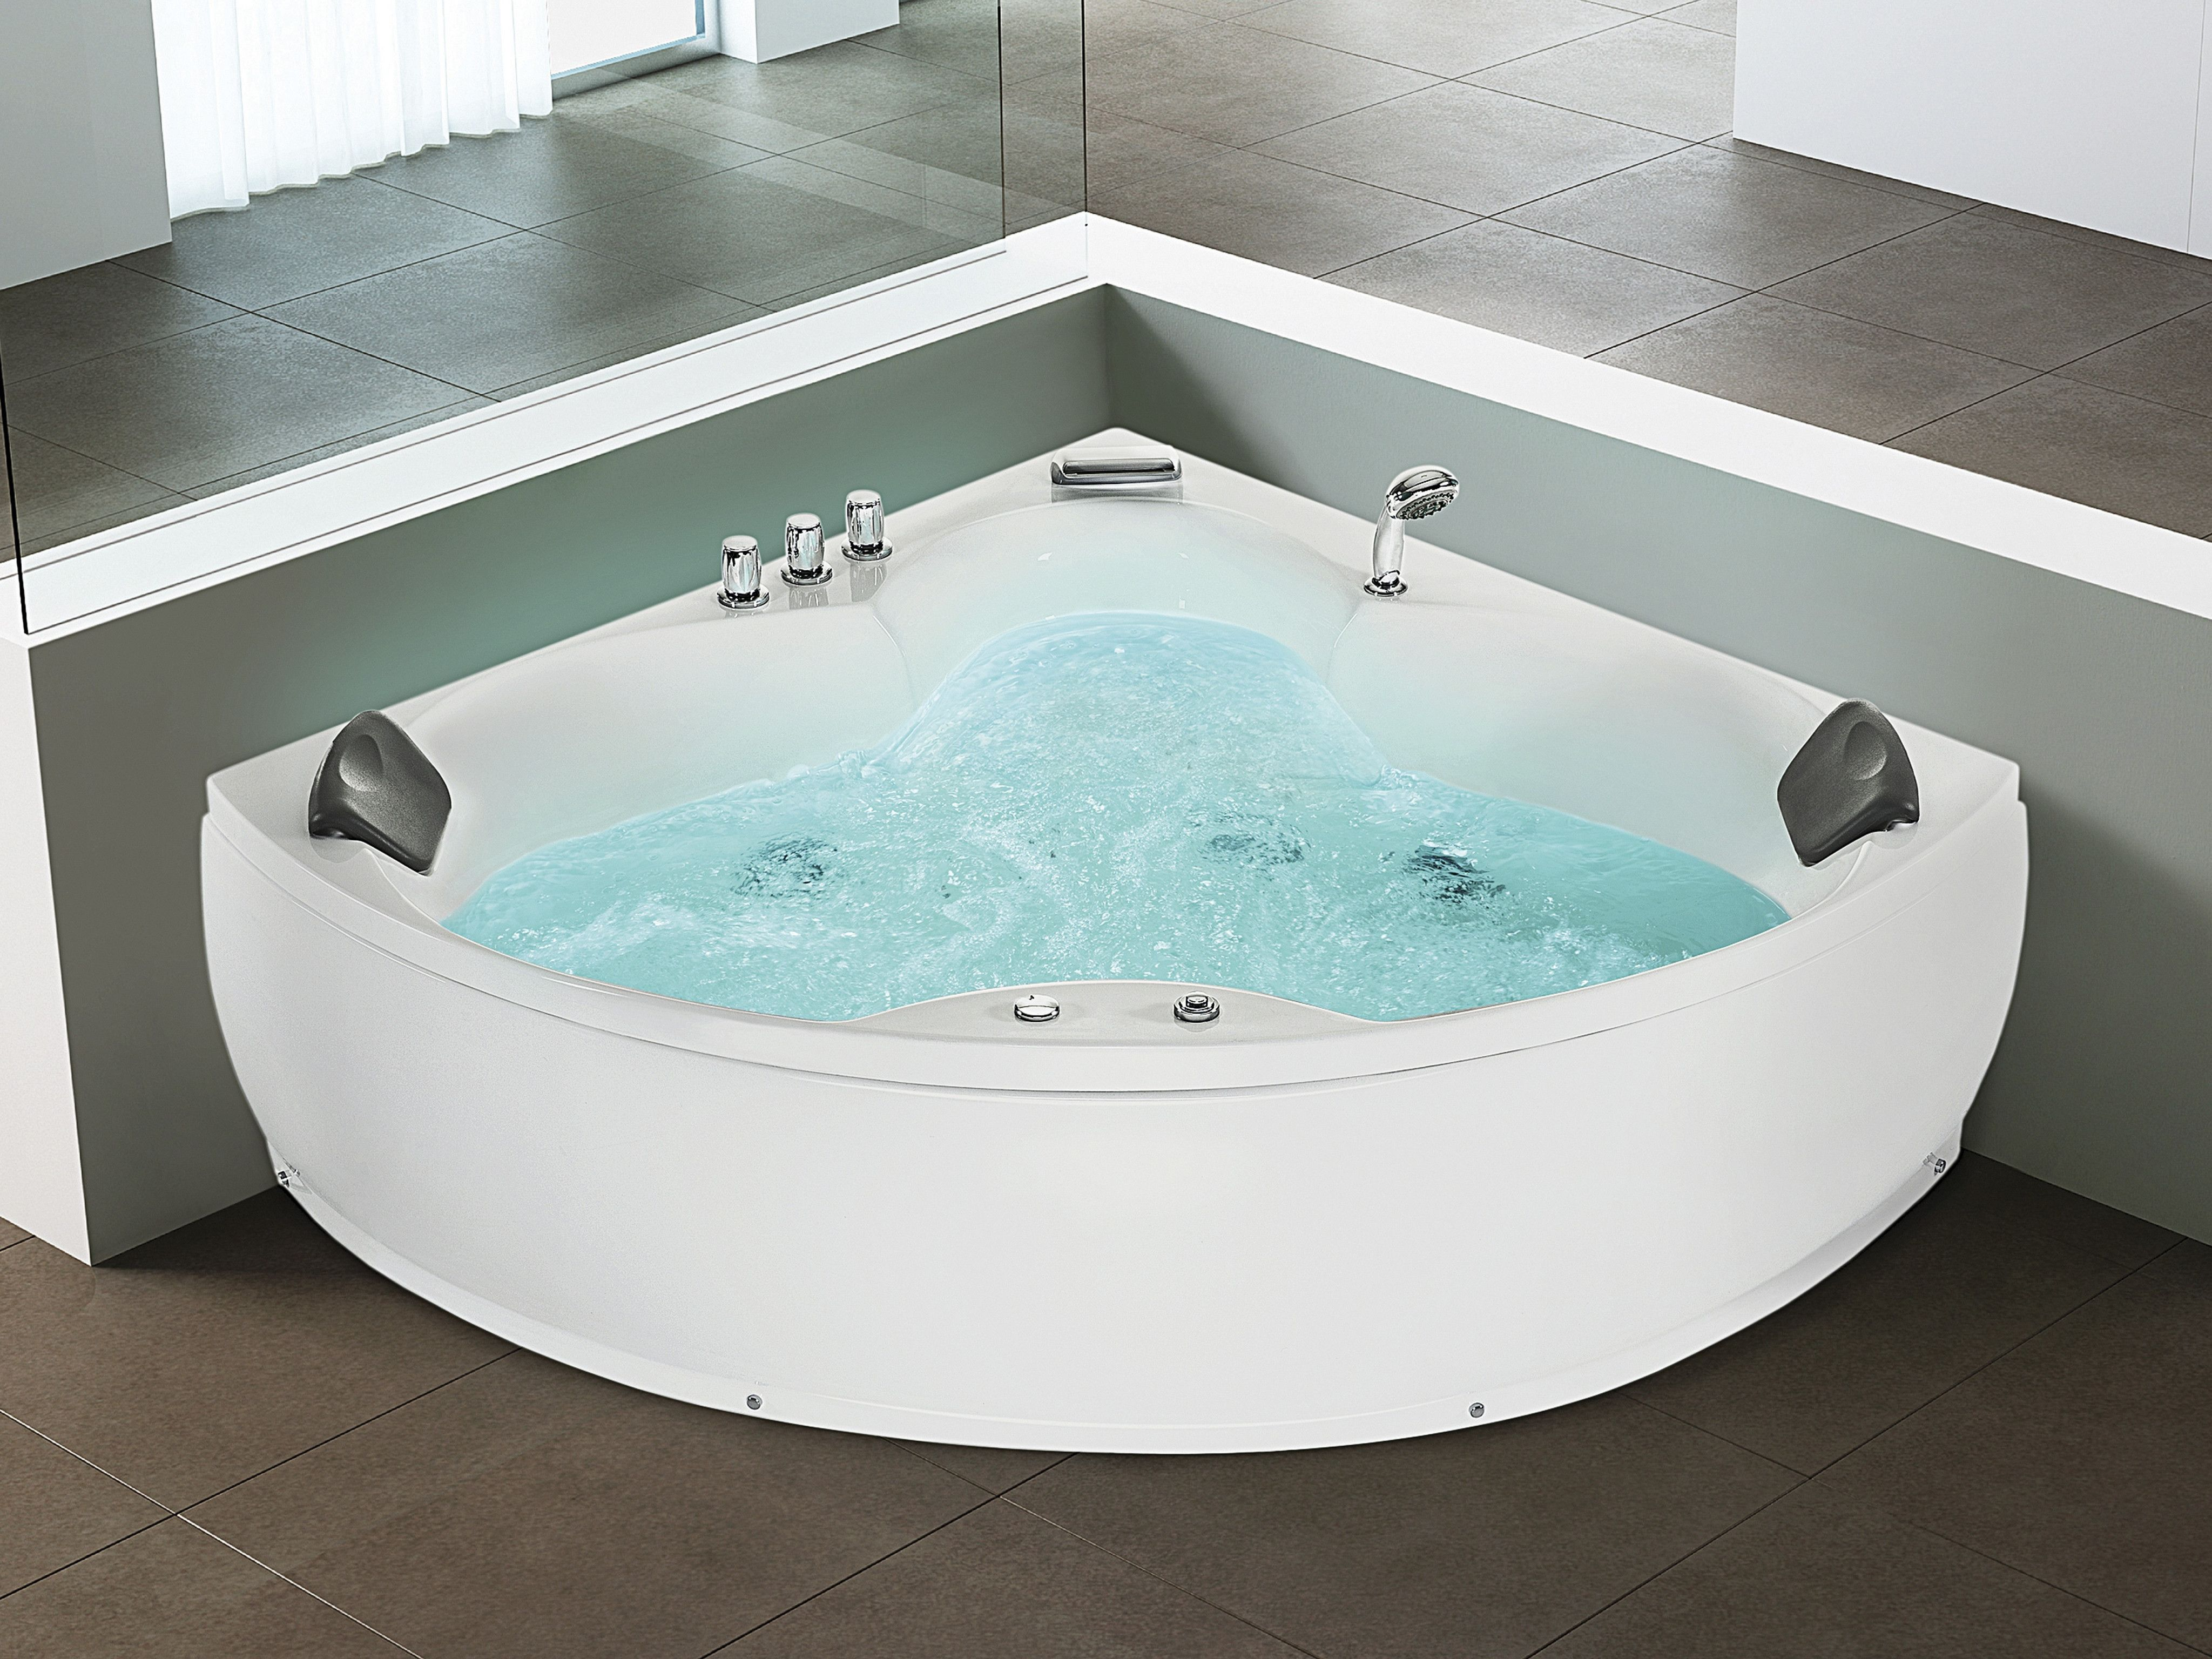 Baignoire Balneo Leroy Merlin Baignoire Balneo Leroy Merlin Baignoire Ilot Une Baignoire Ilot Pour Une Salle De Bains Corner Bathtub Jacuzzi Bathroom Bathtub